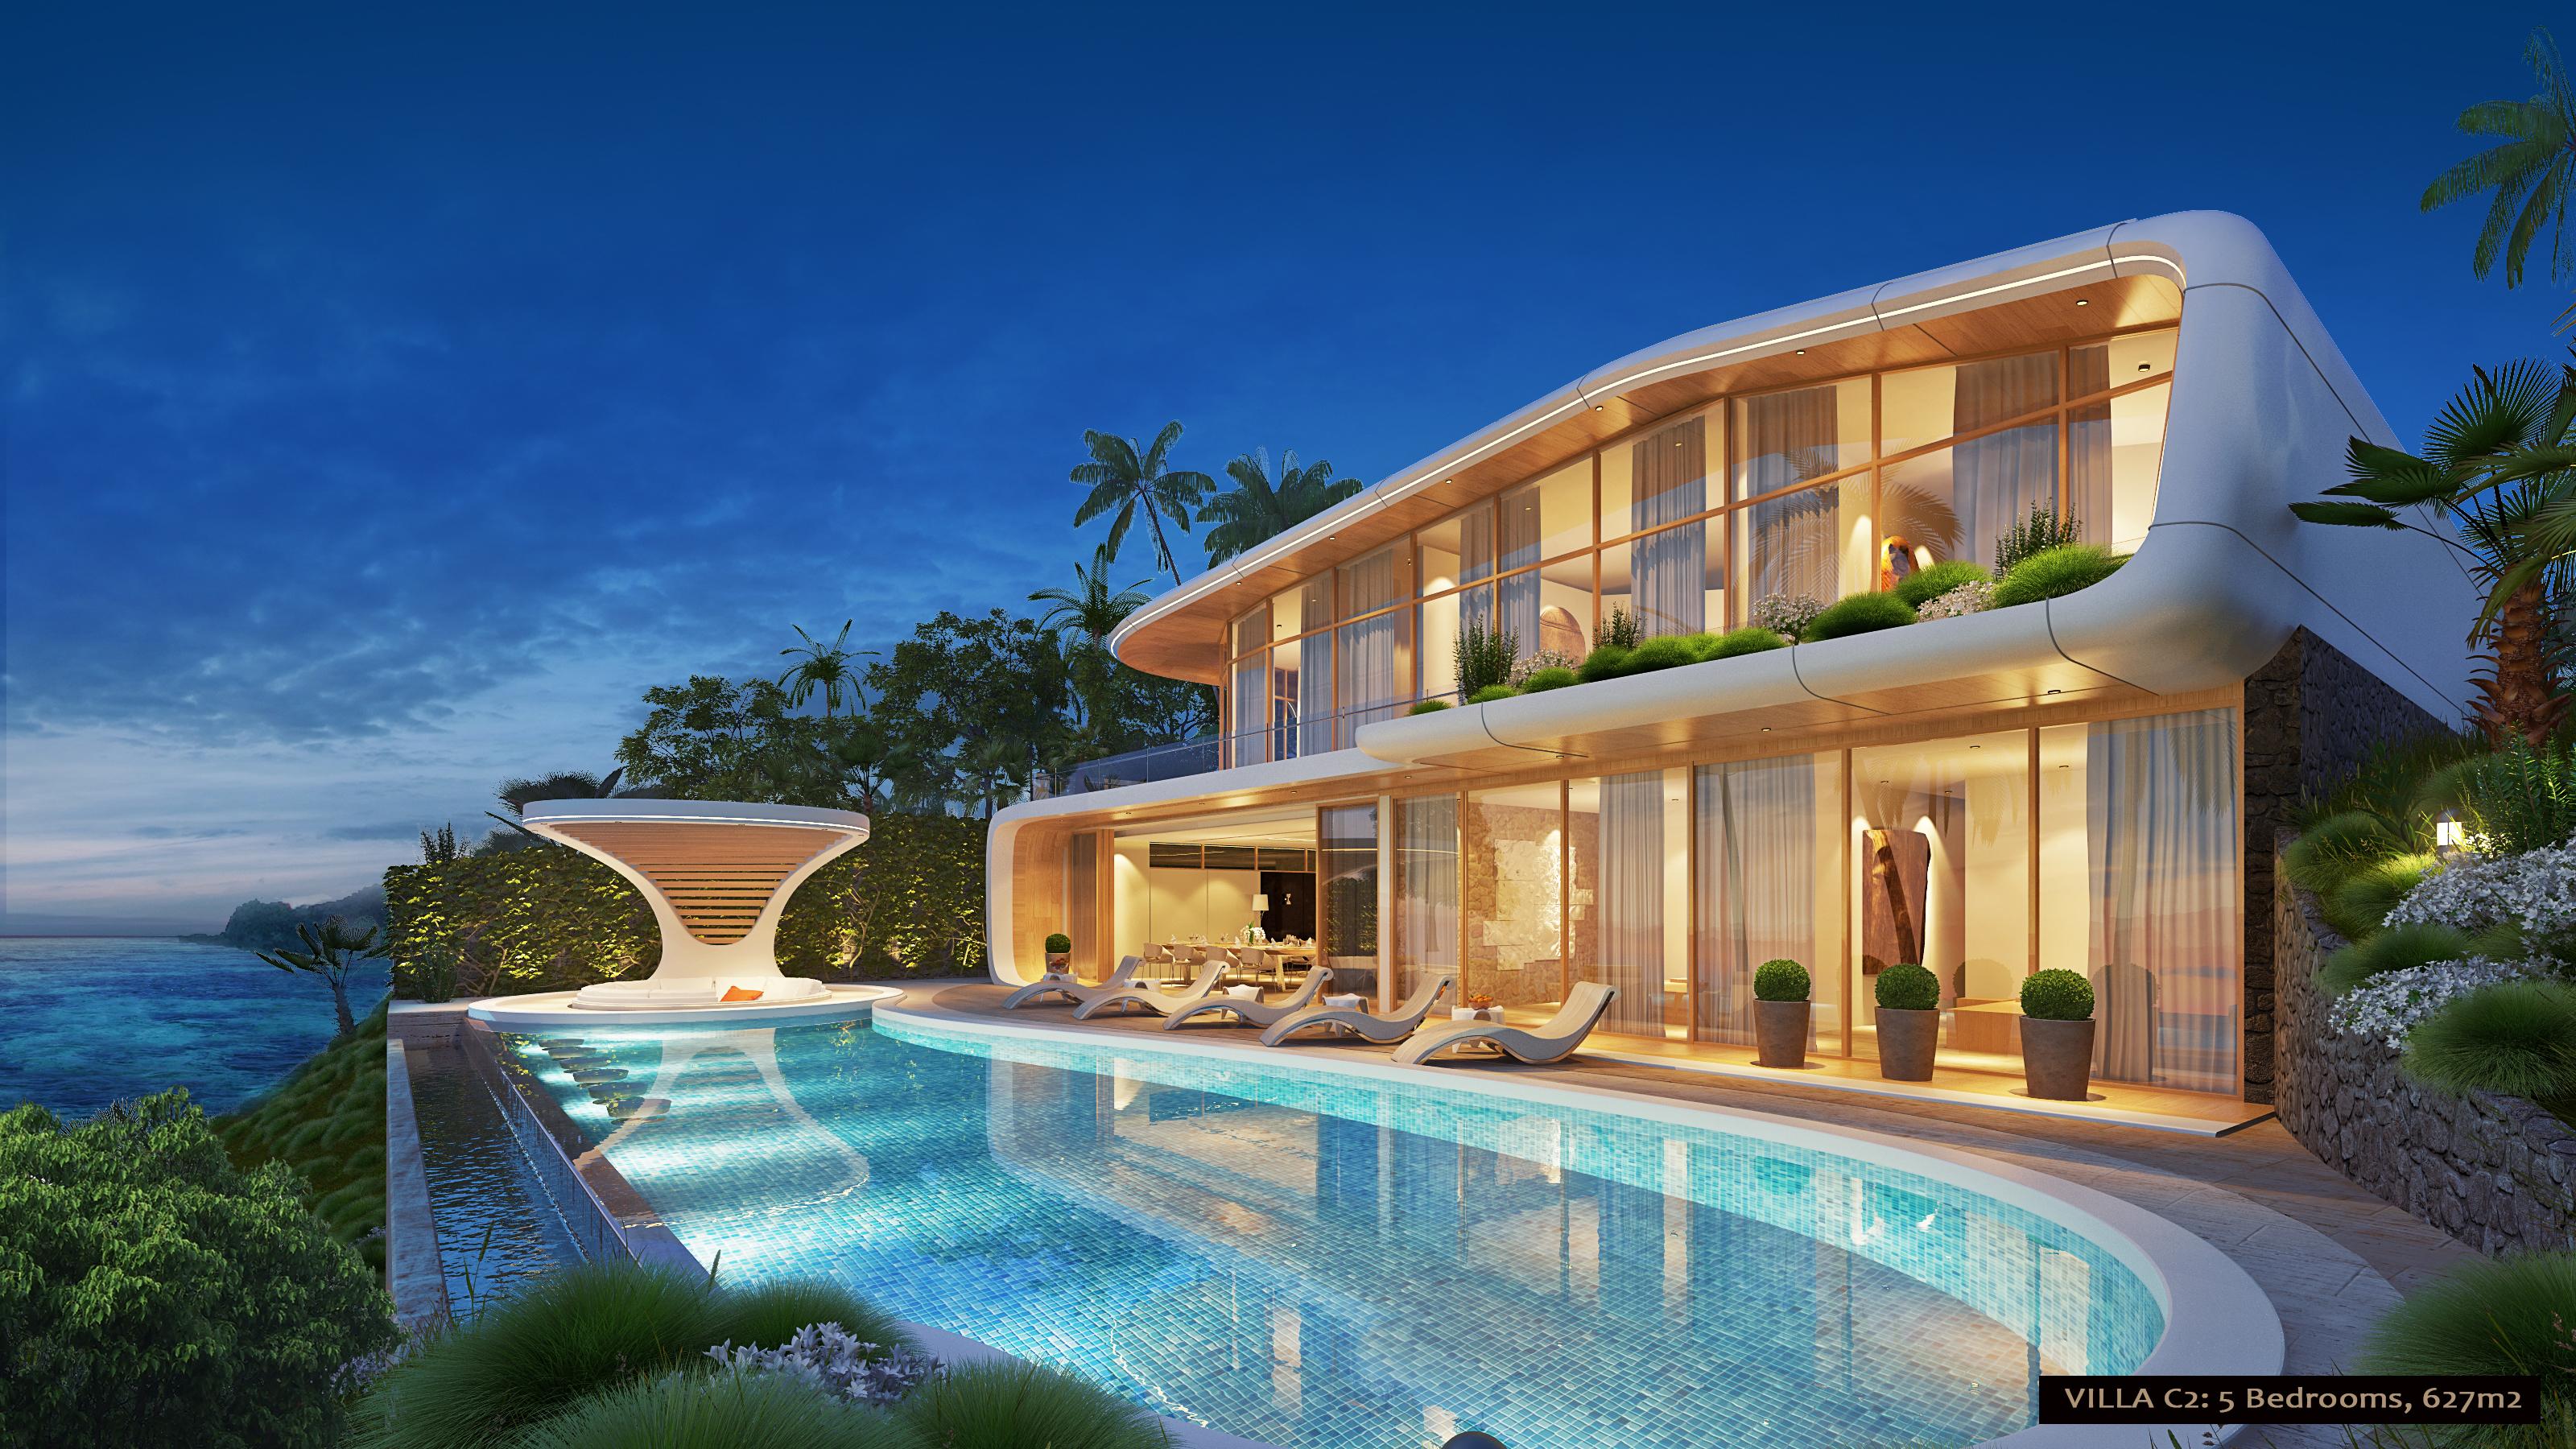 5 Bedroom Dynamic Seaview Villa